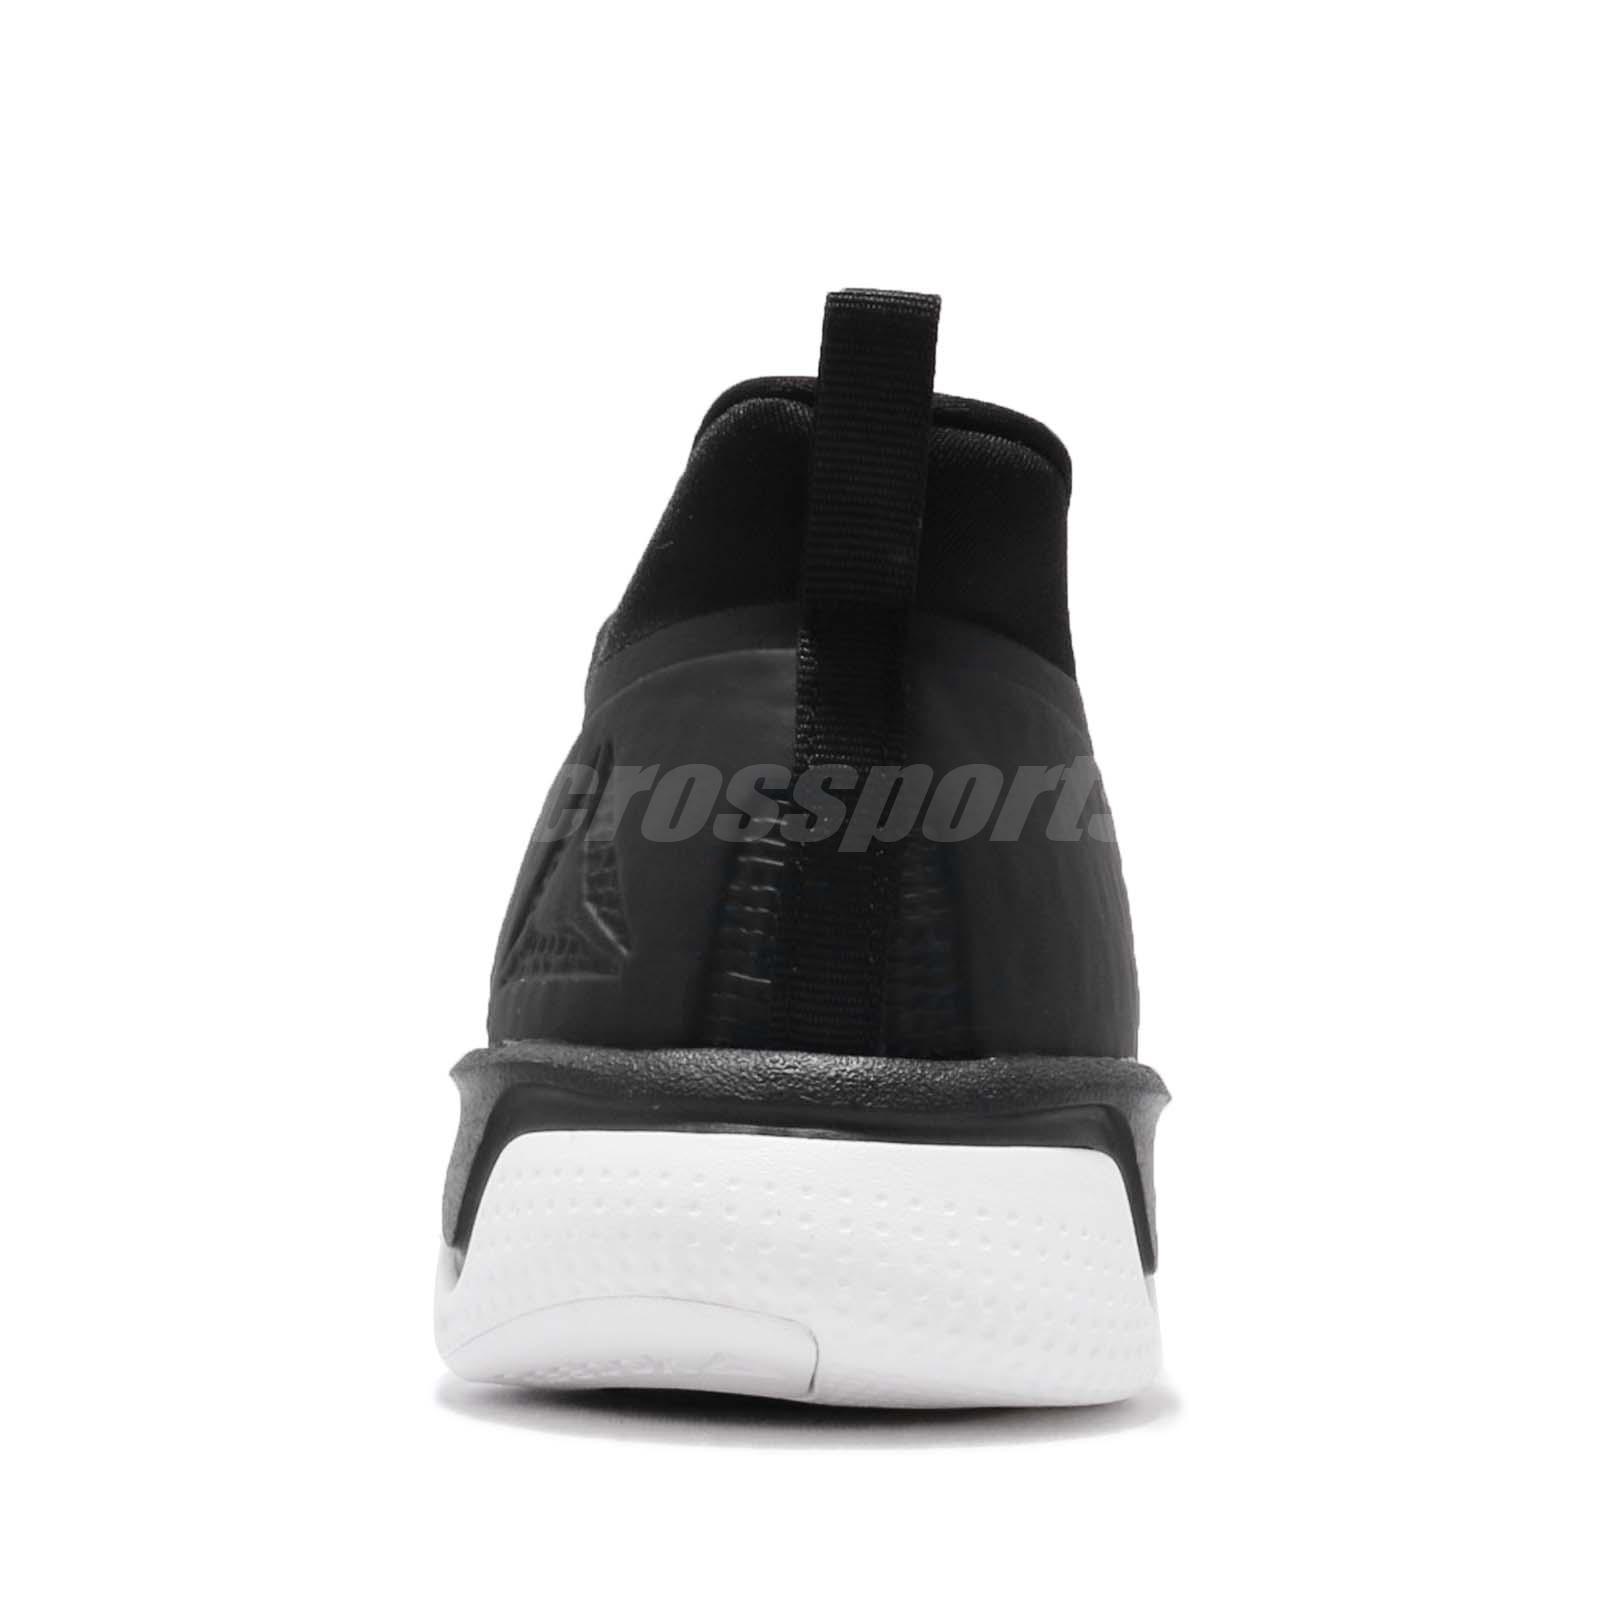 e57882b8 Reebok Print Run 3.0 Black White Men Running Training Shoes Sneakers ...